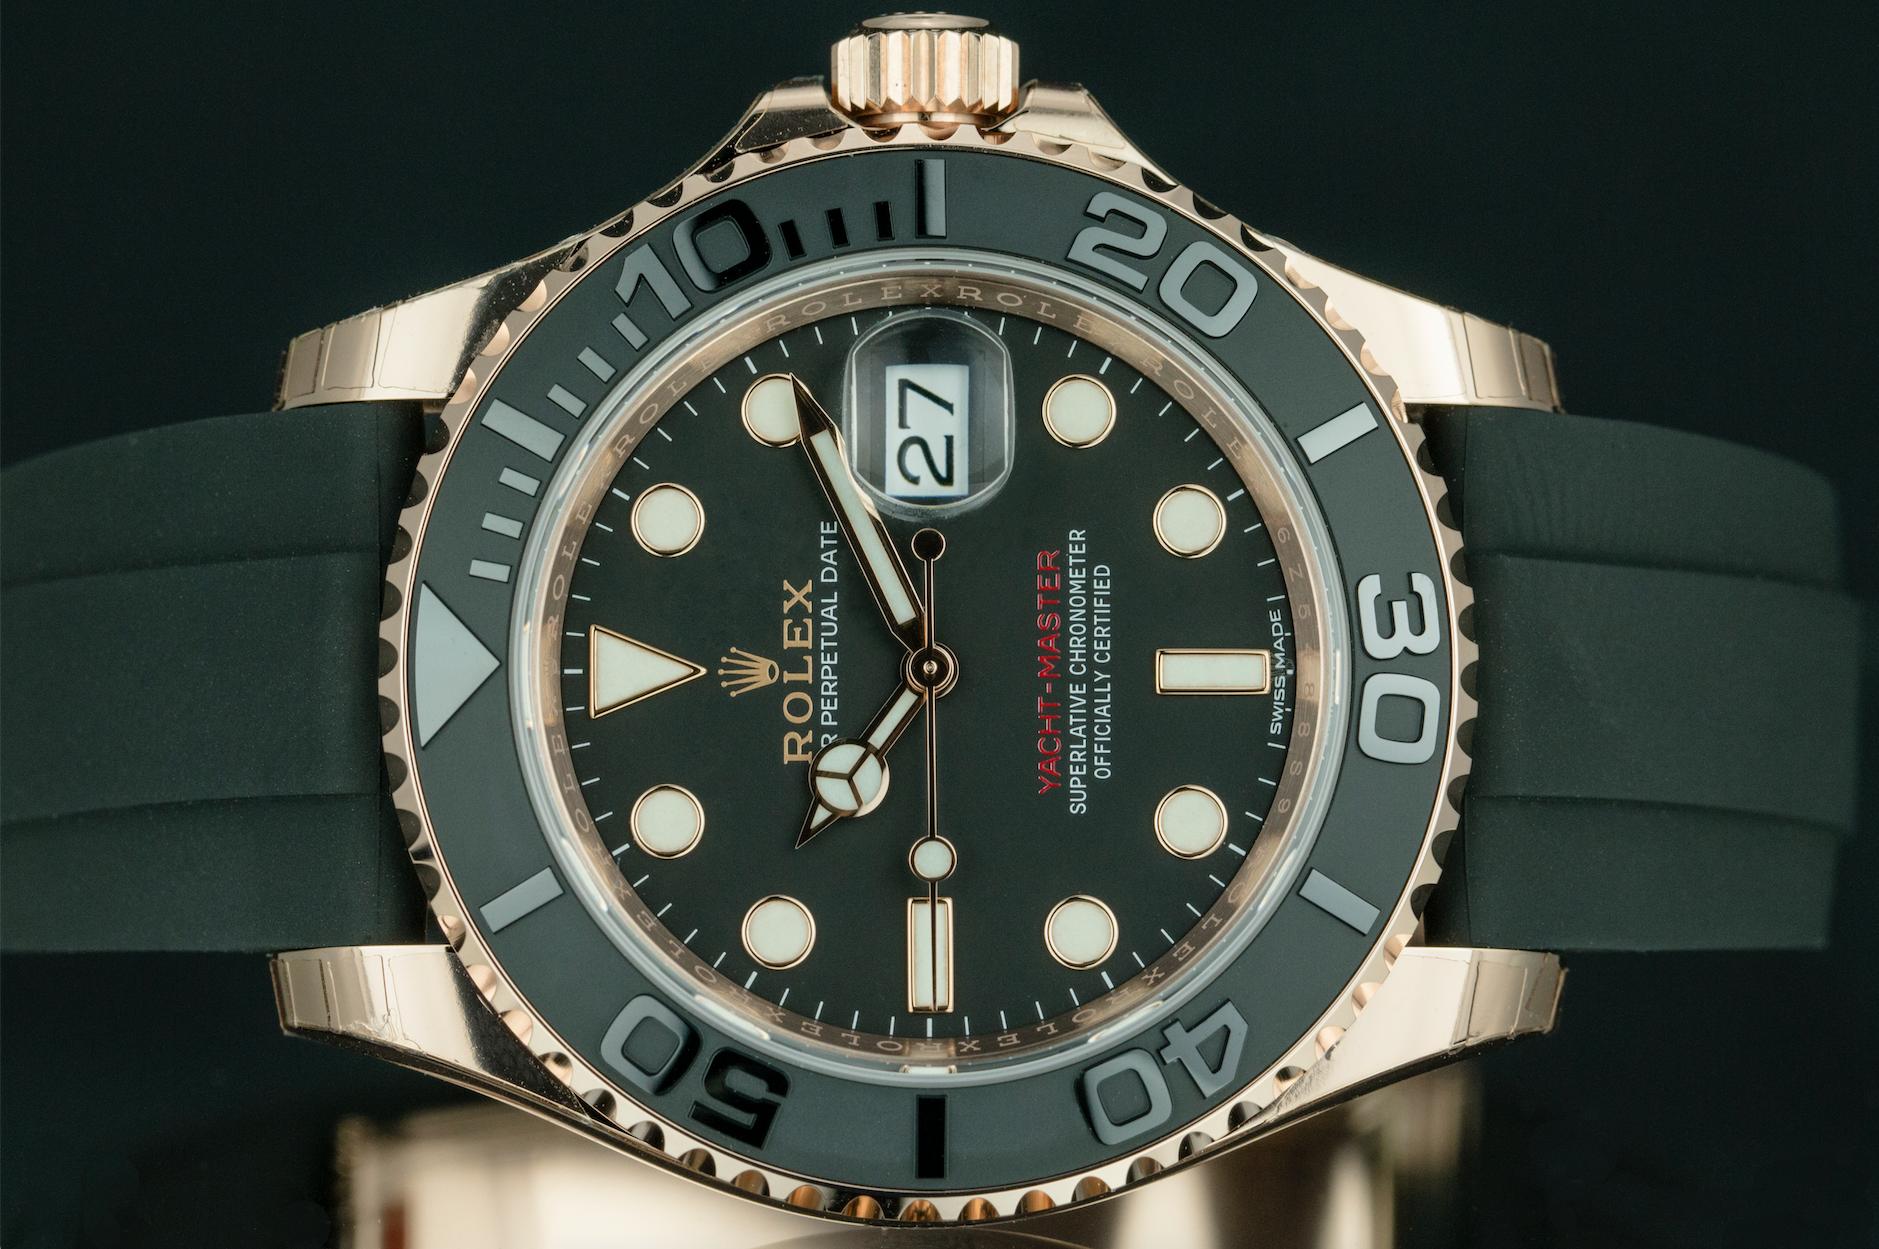 Rolex Yacht Master 18k Gold Oyster Flex Band Rolex Best Watches For Men Luxury Watches For Men